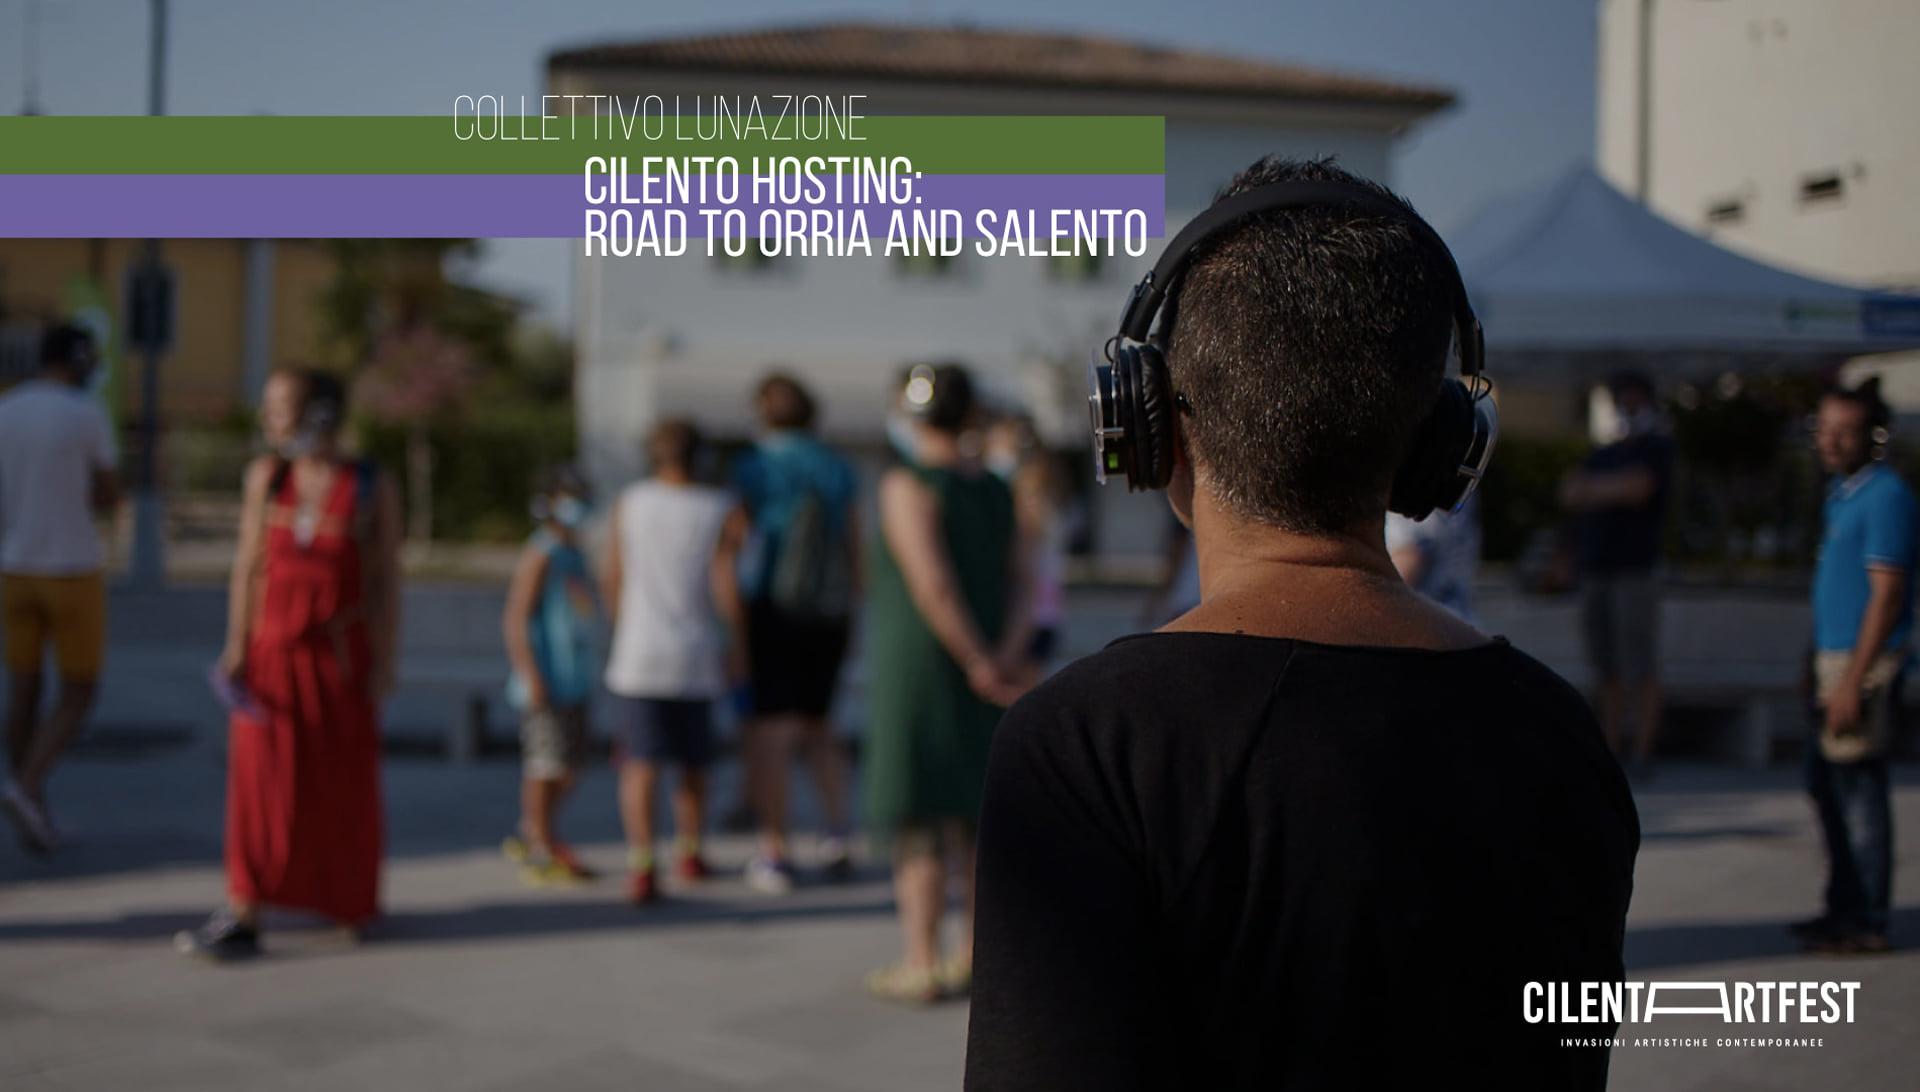 26-27 AGOSTO 2021   Cilento Hosting: Road To Salento